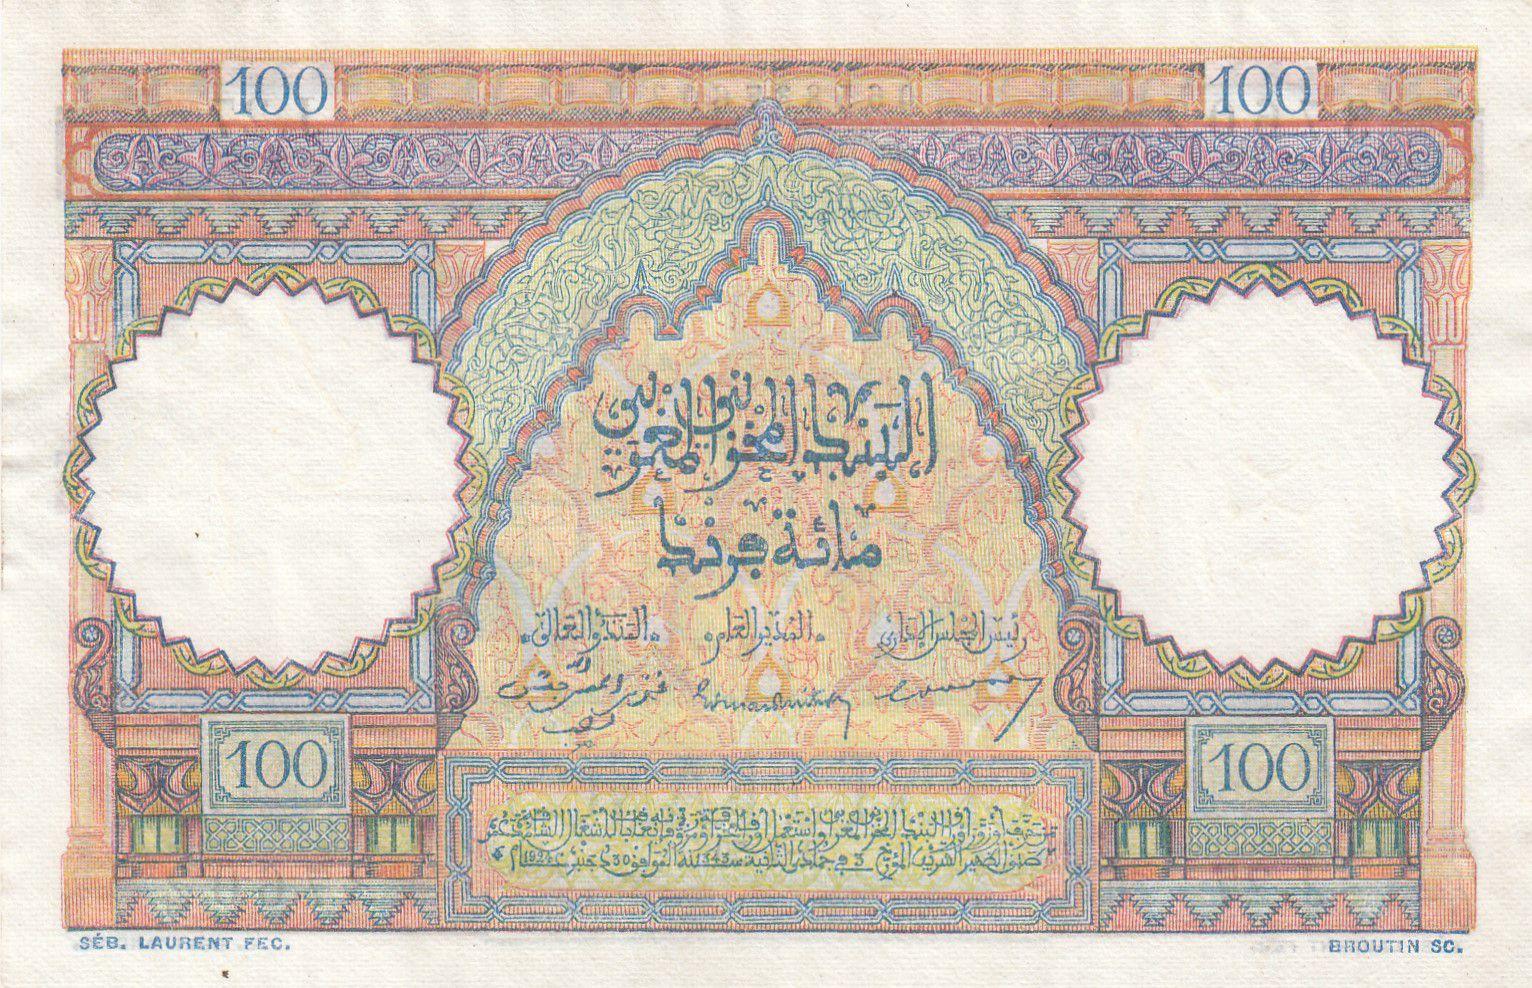 Maroc 100 Francs - Ksar d\'Aït-ben-haddou - 09-01-1950 - SUP - Série J.27 - P.45